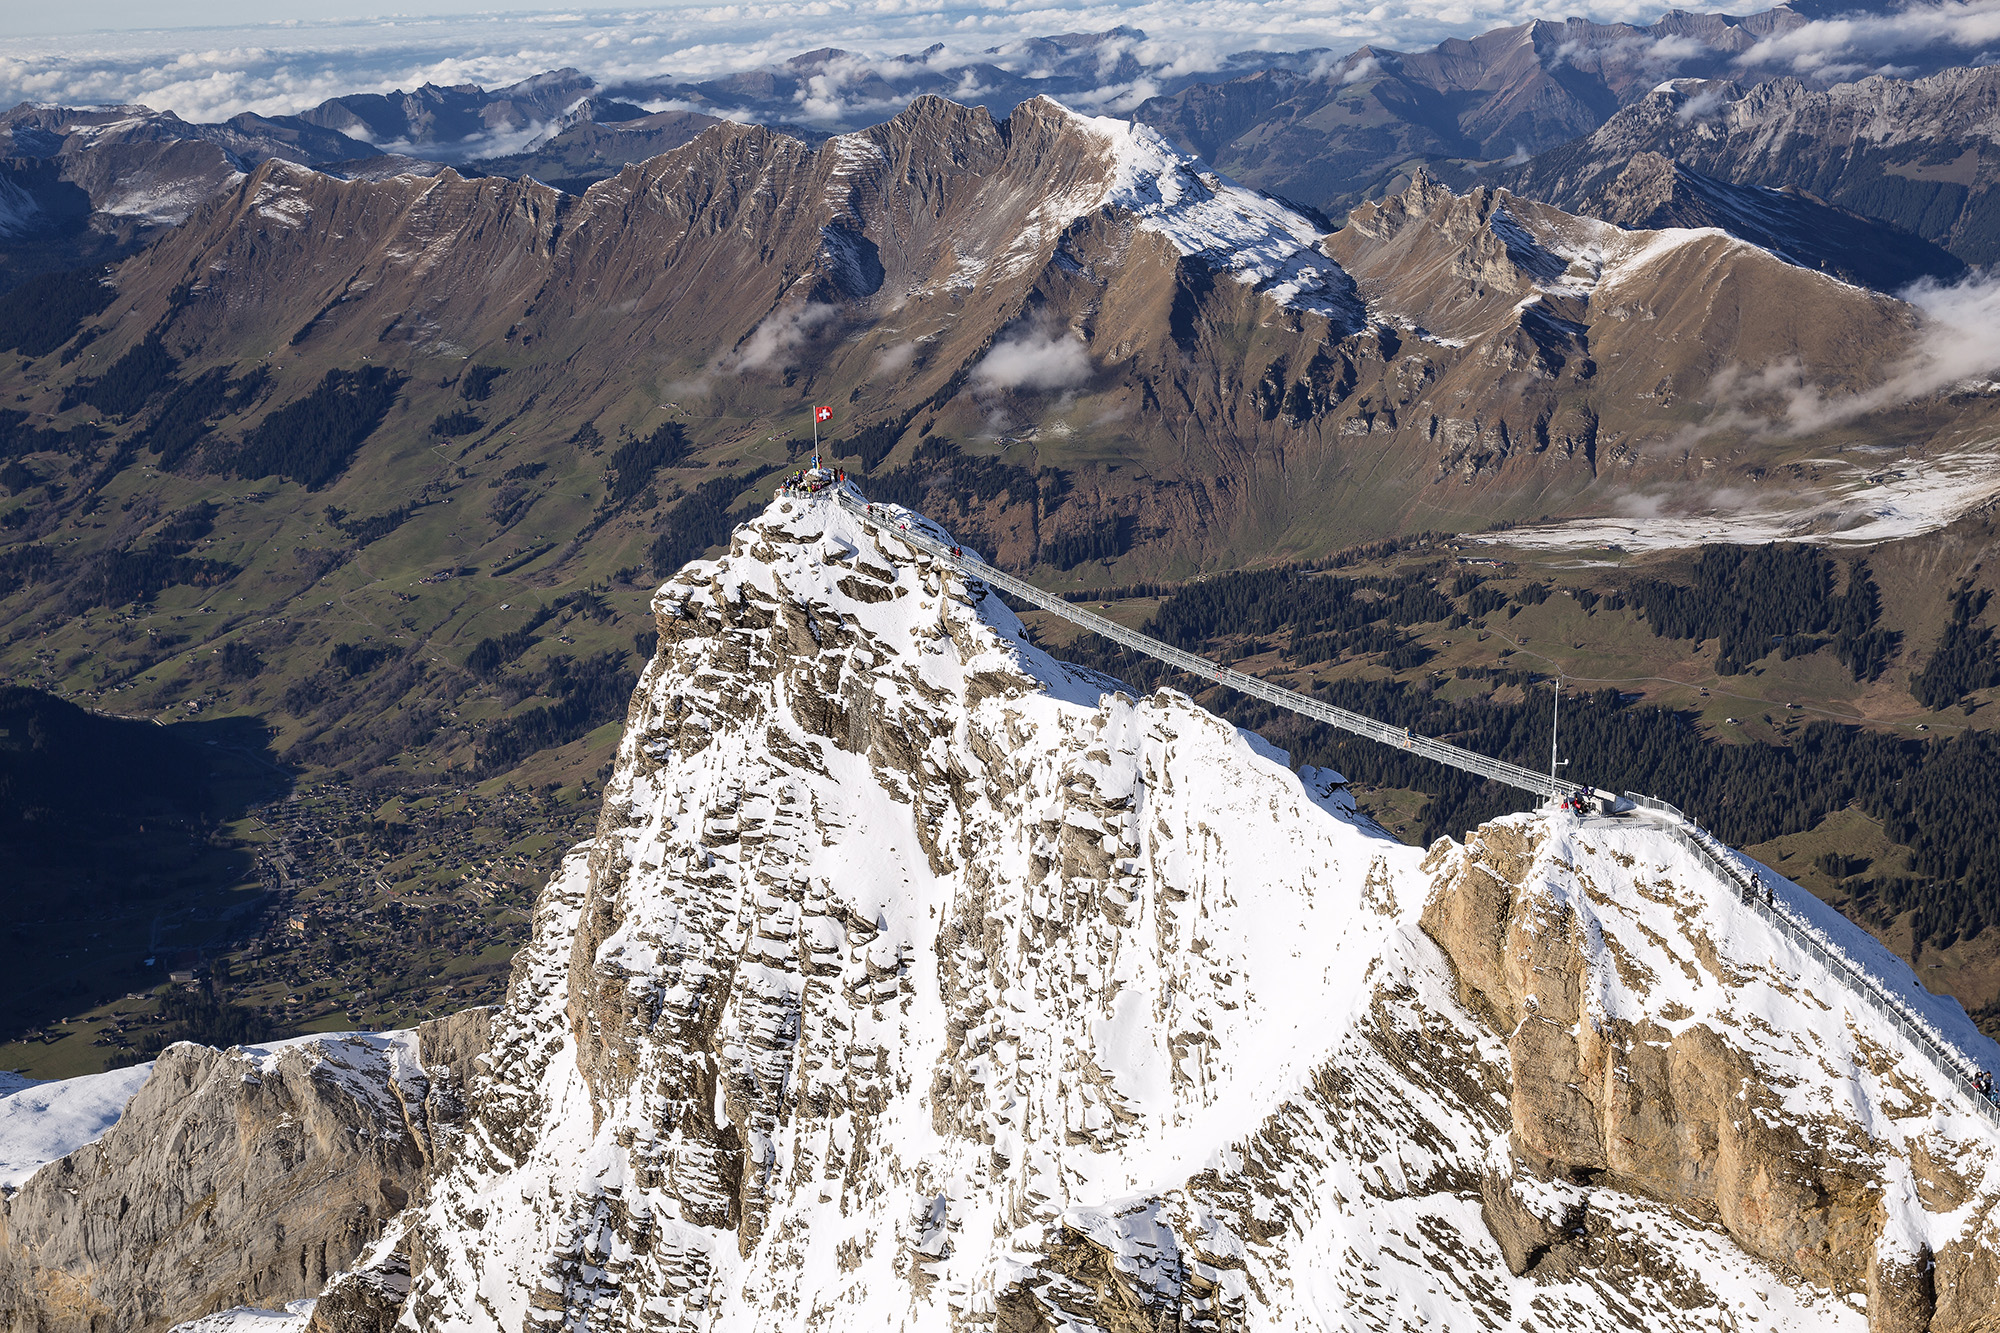 kt_2020_320_Keytours_excursions_Swisstours_glacier3000_peak_walk1_2048_10